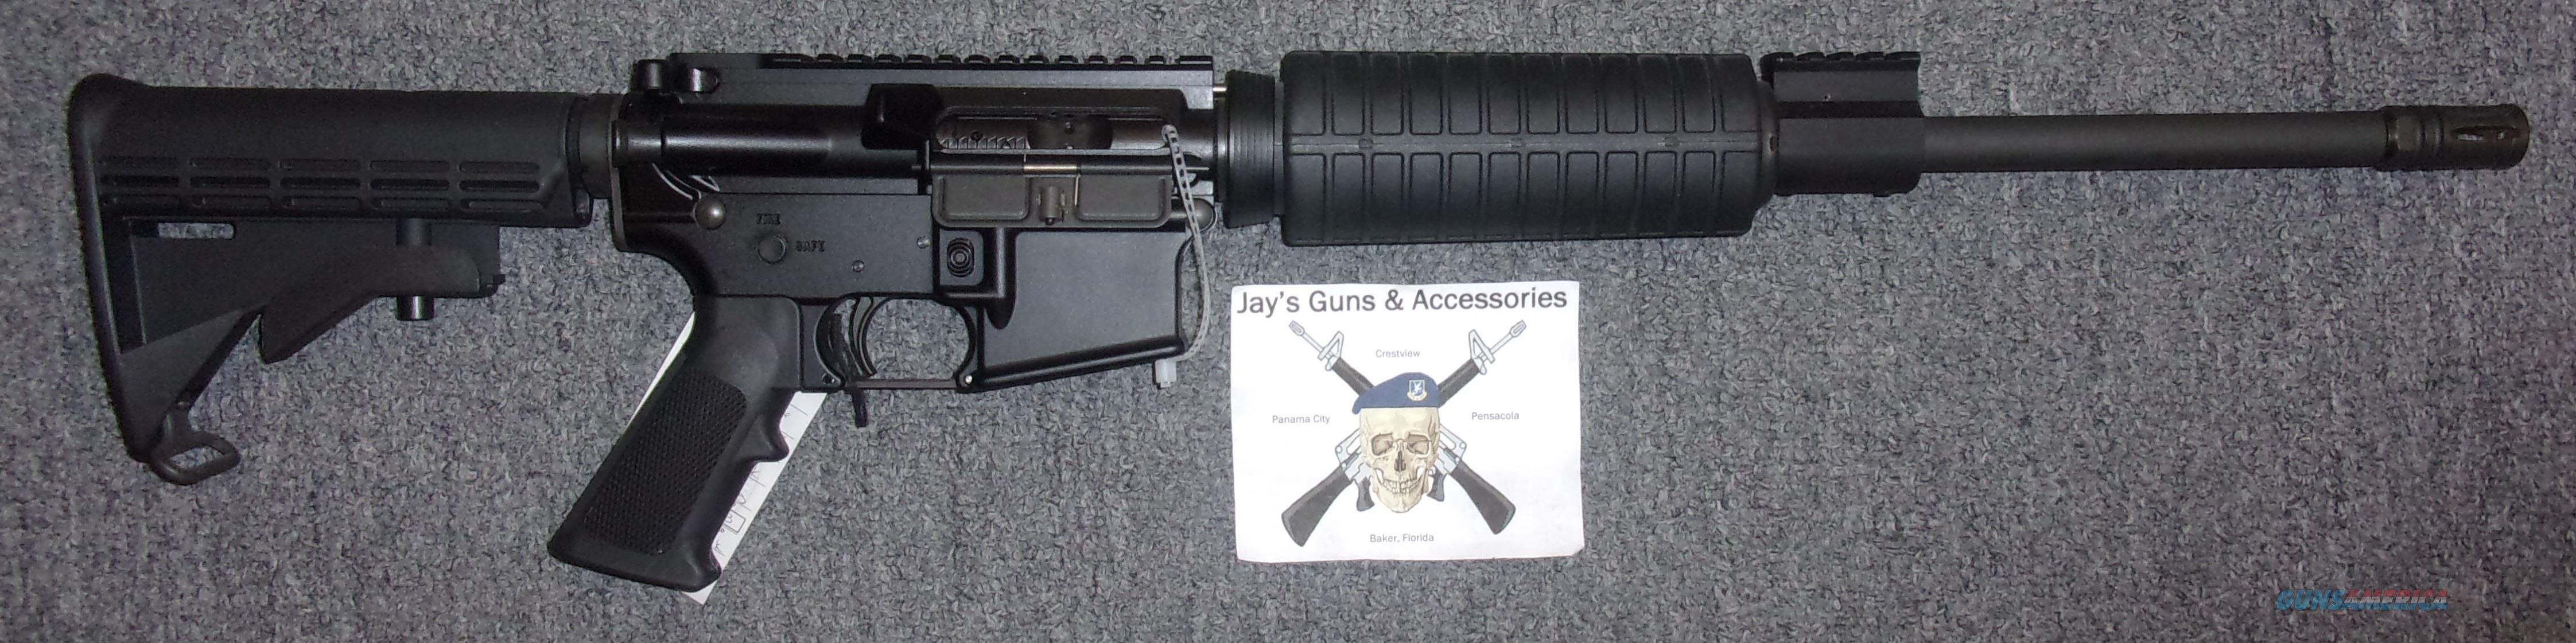 Olympic Arms M.F.R.  Guns > Rifles > Olympic Arms Rifles